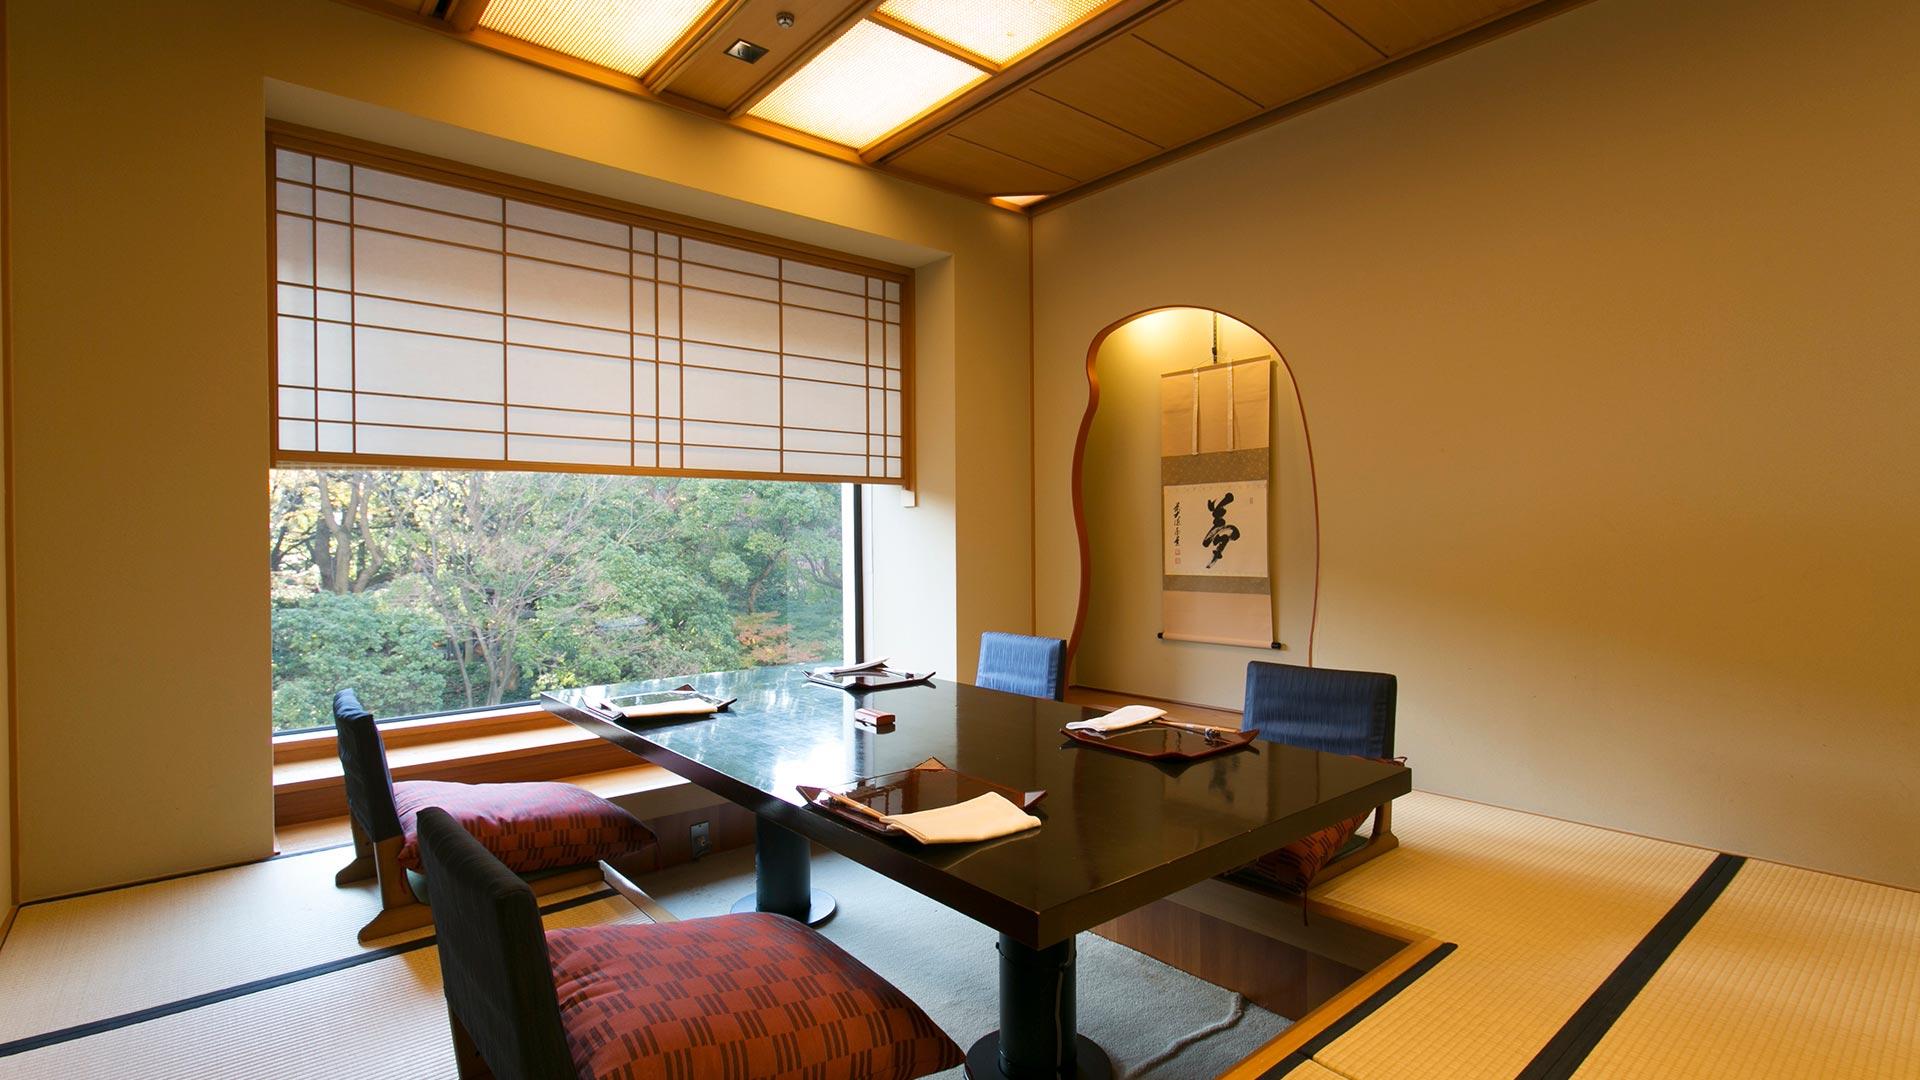 Kioi Nadaman Dining Hotel New Otani Tokyo